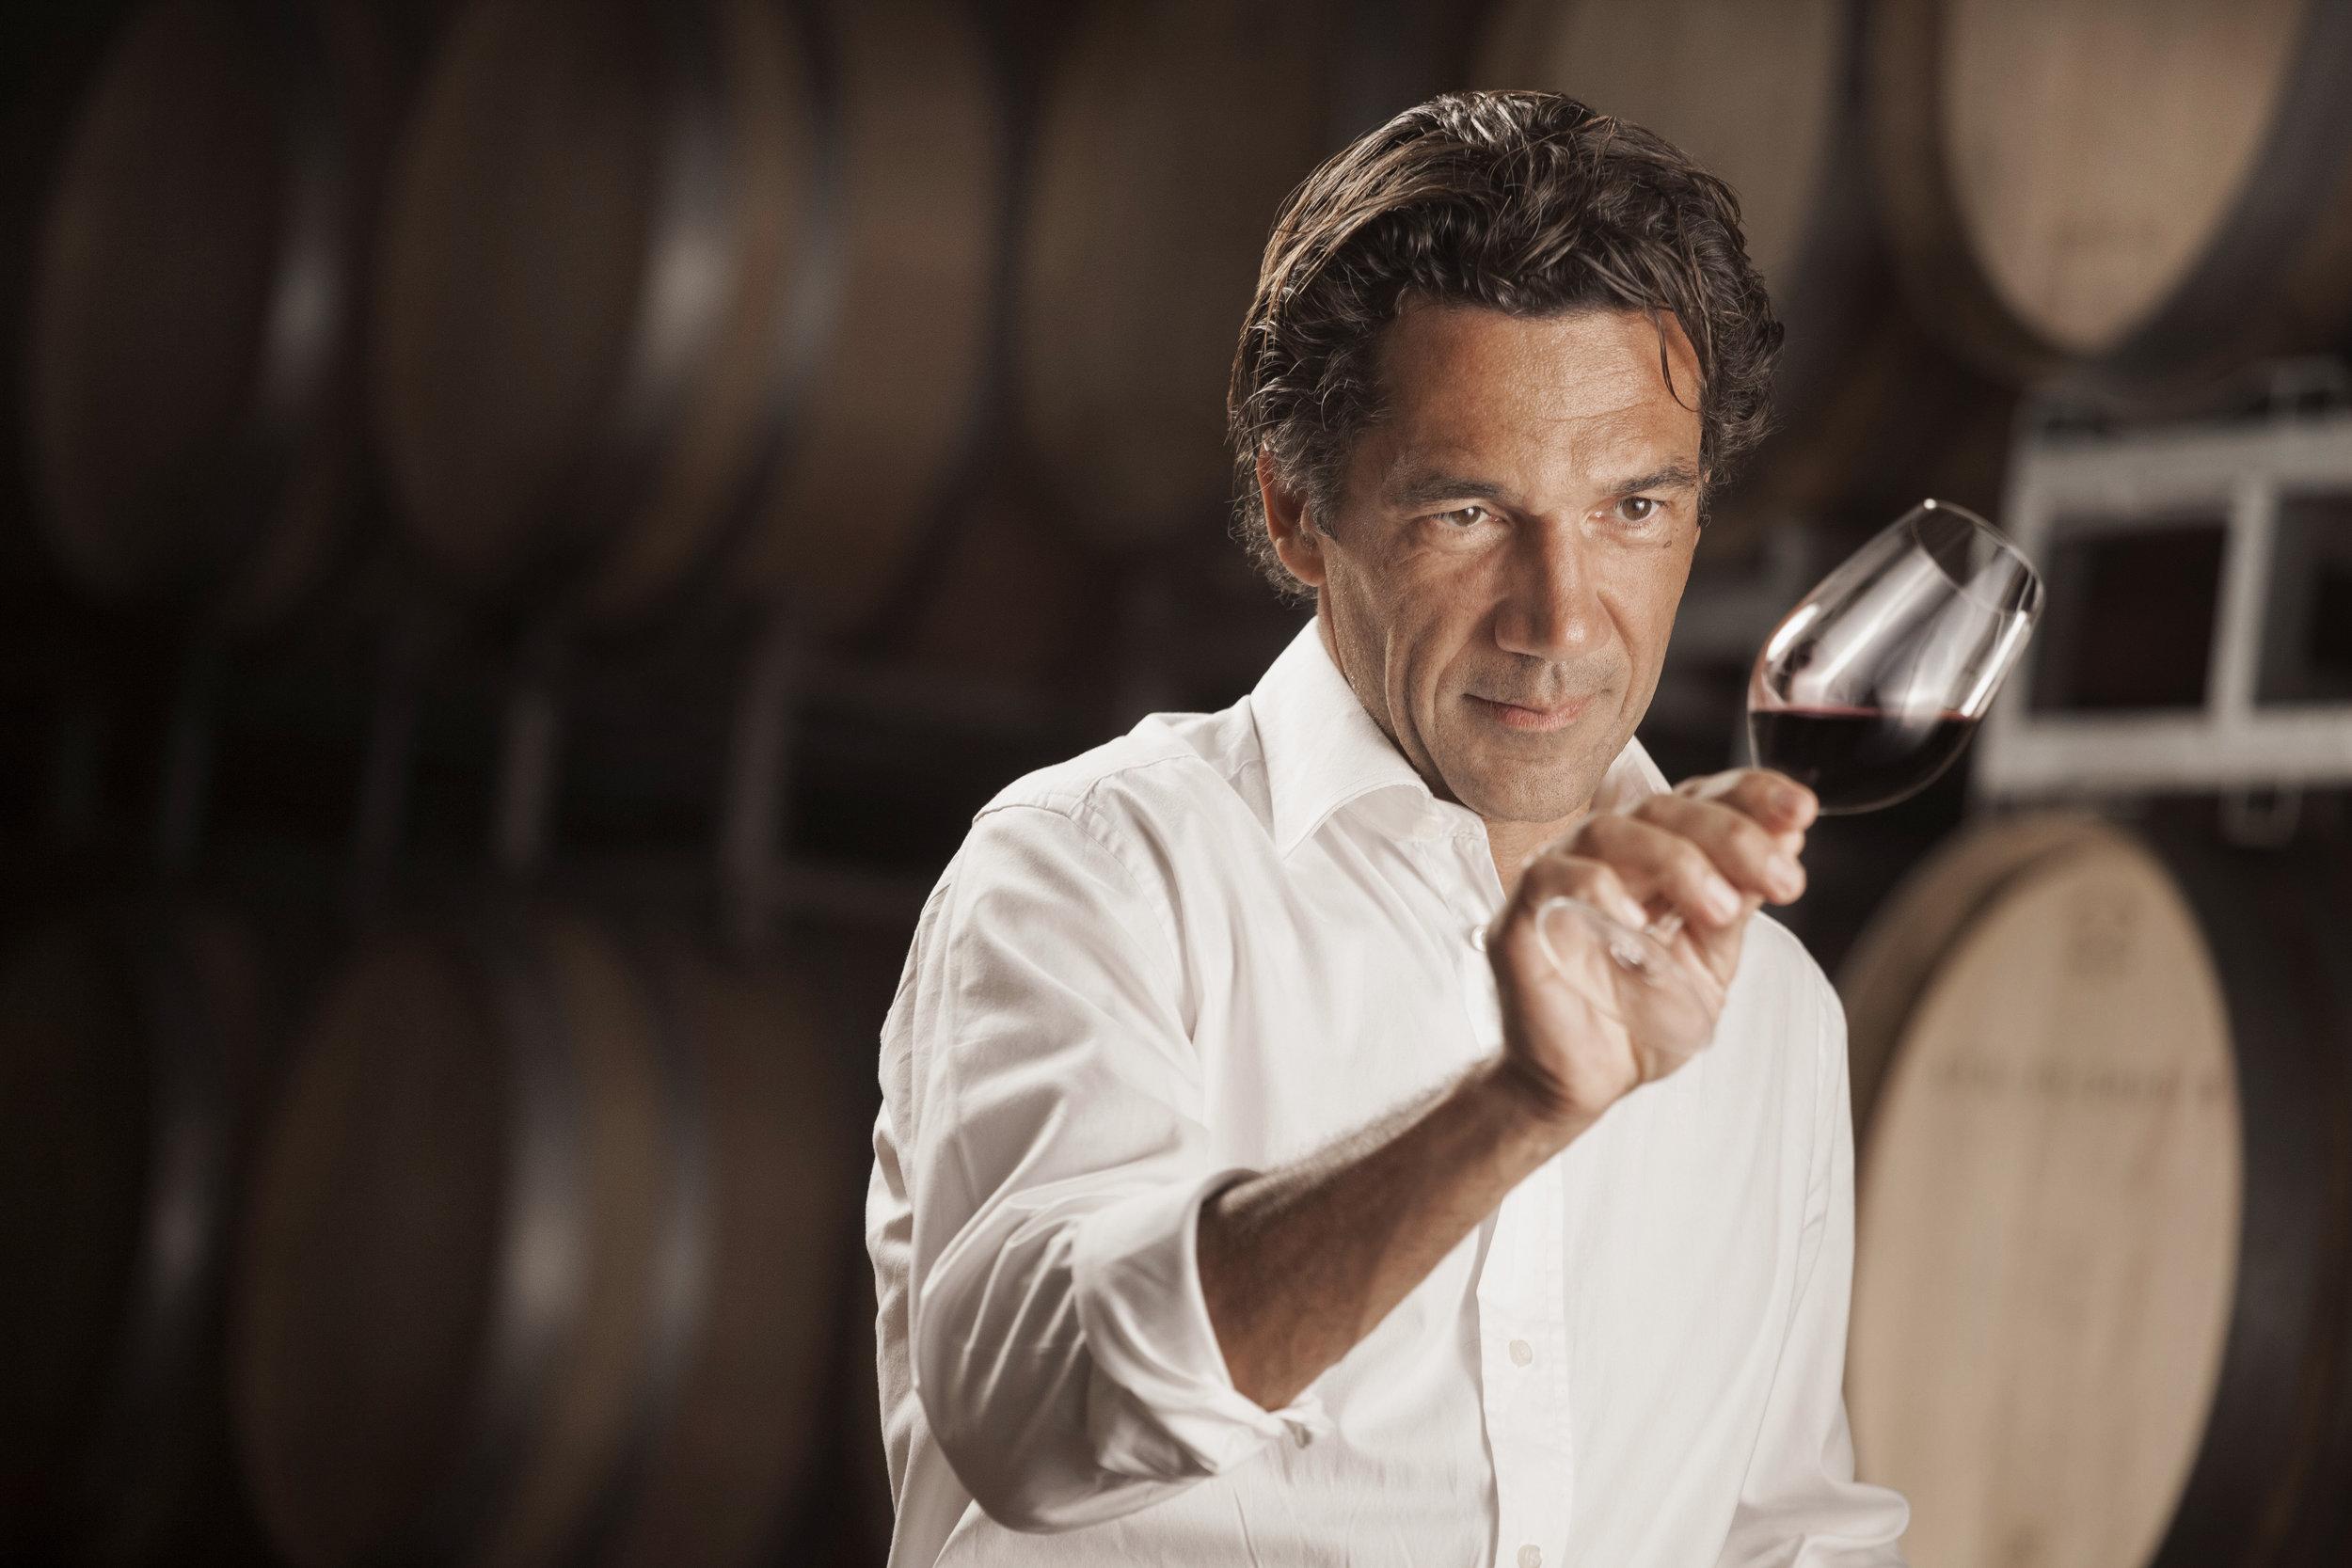 Jean-Claude Mas winemaker and owner of Paul Mas wines (Image: Domaine Paul Mas)